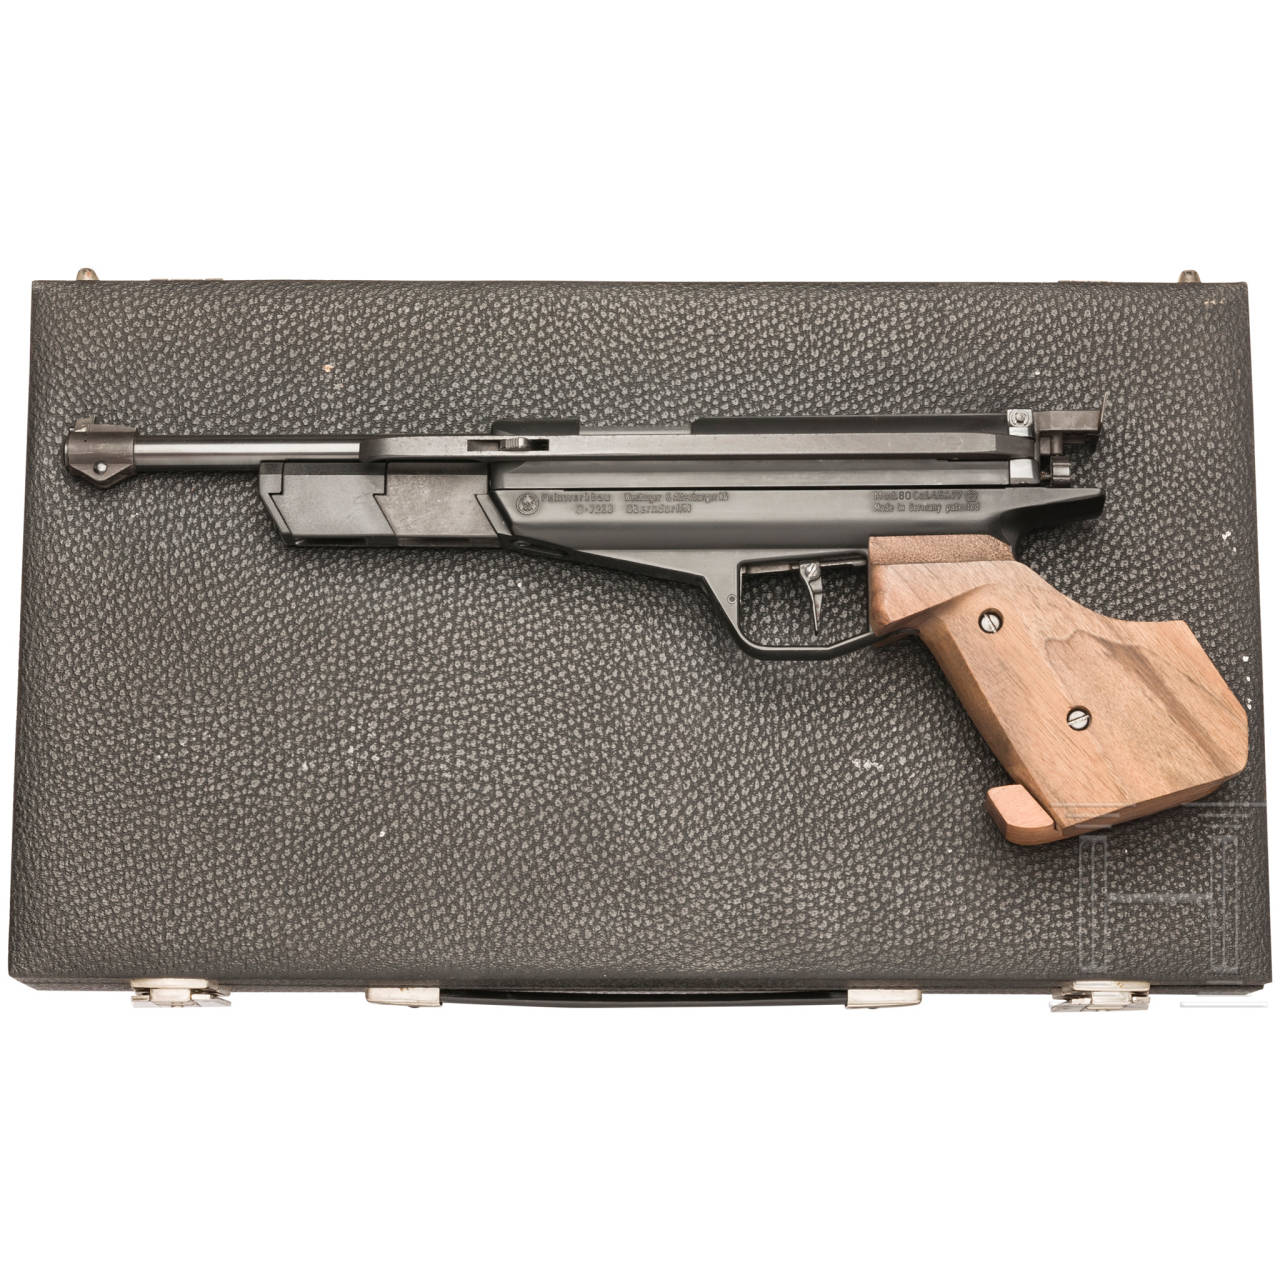 Luftpistole Feinwerkbau Mod. 80, im Koffer